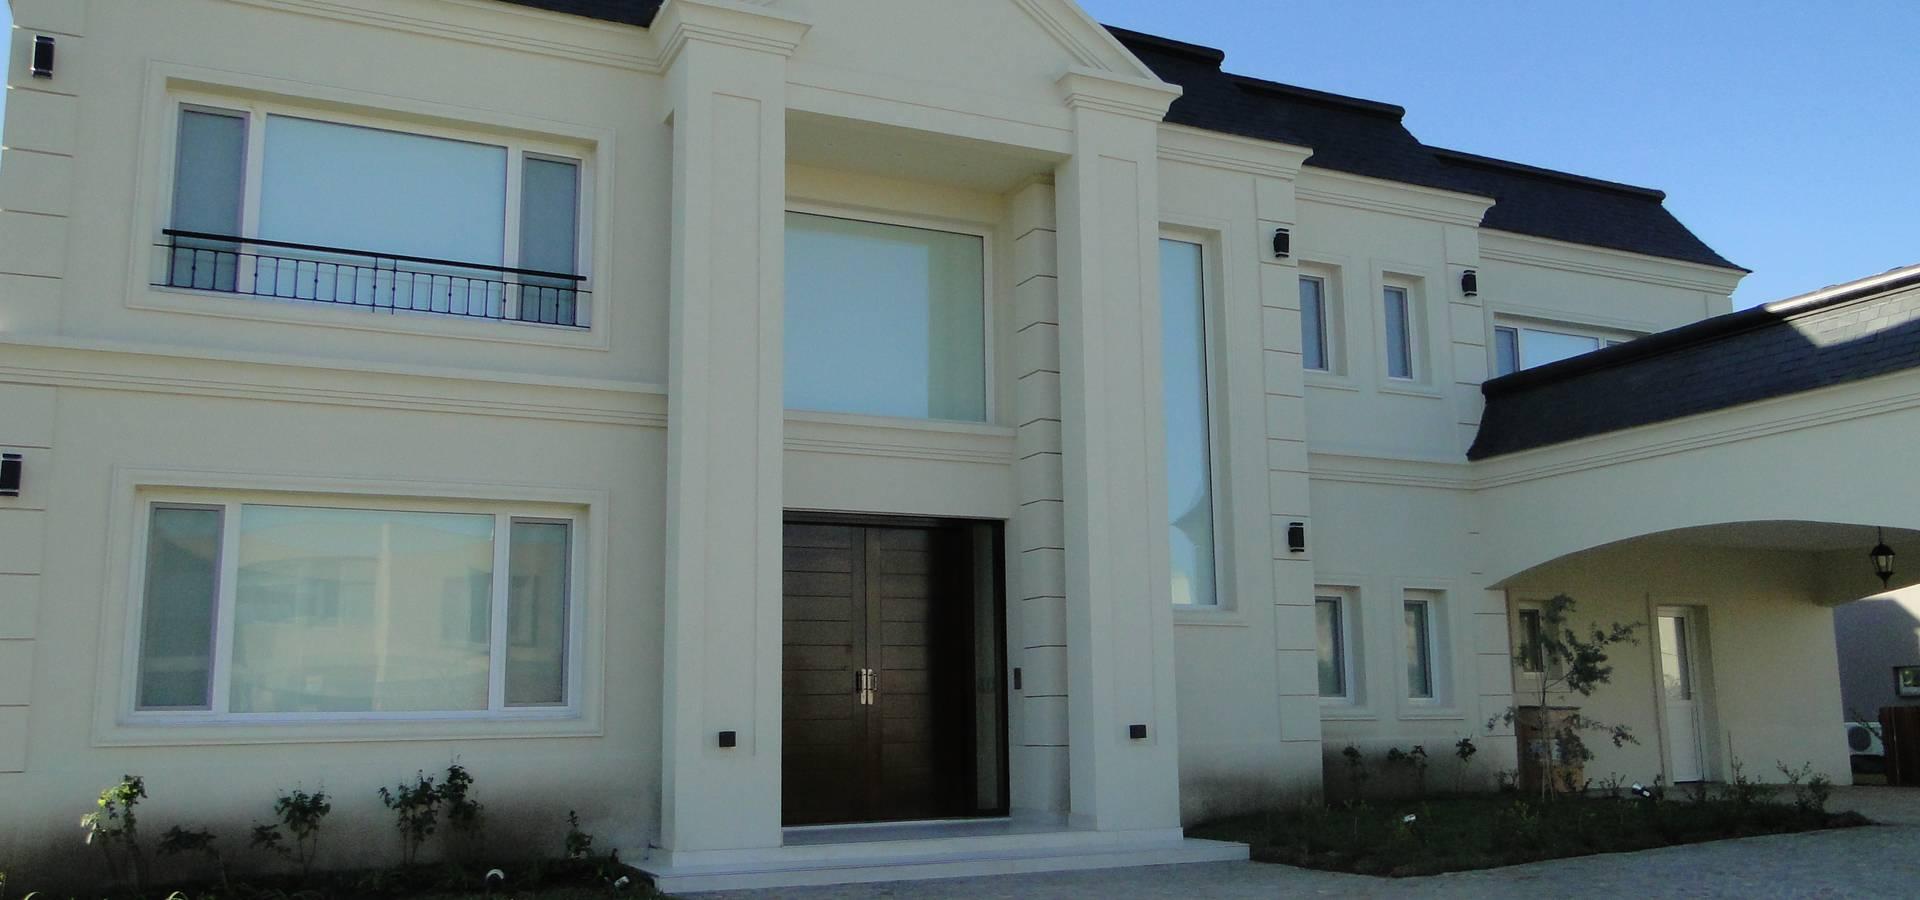 Arquitectos Building M&CC—(Marcelo Rueda, Claudio Castiglia y Claudia Rueda)